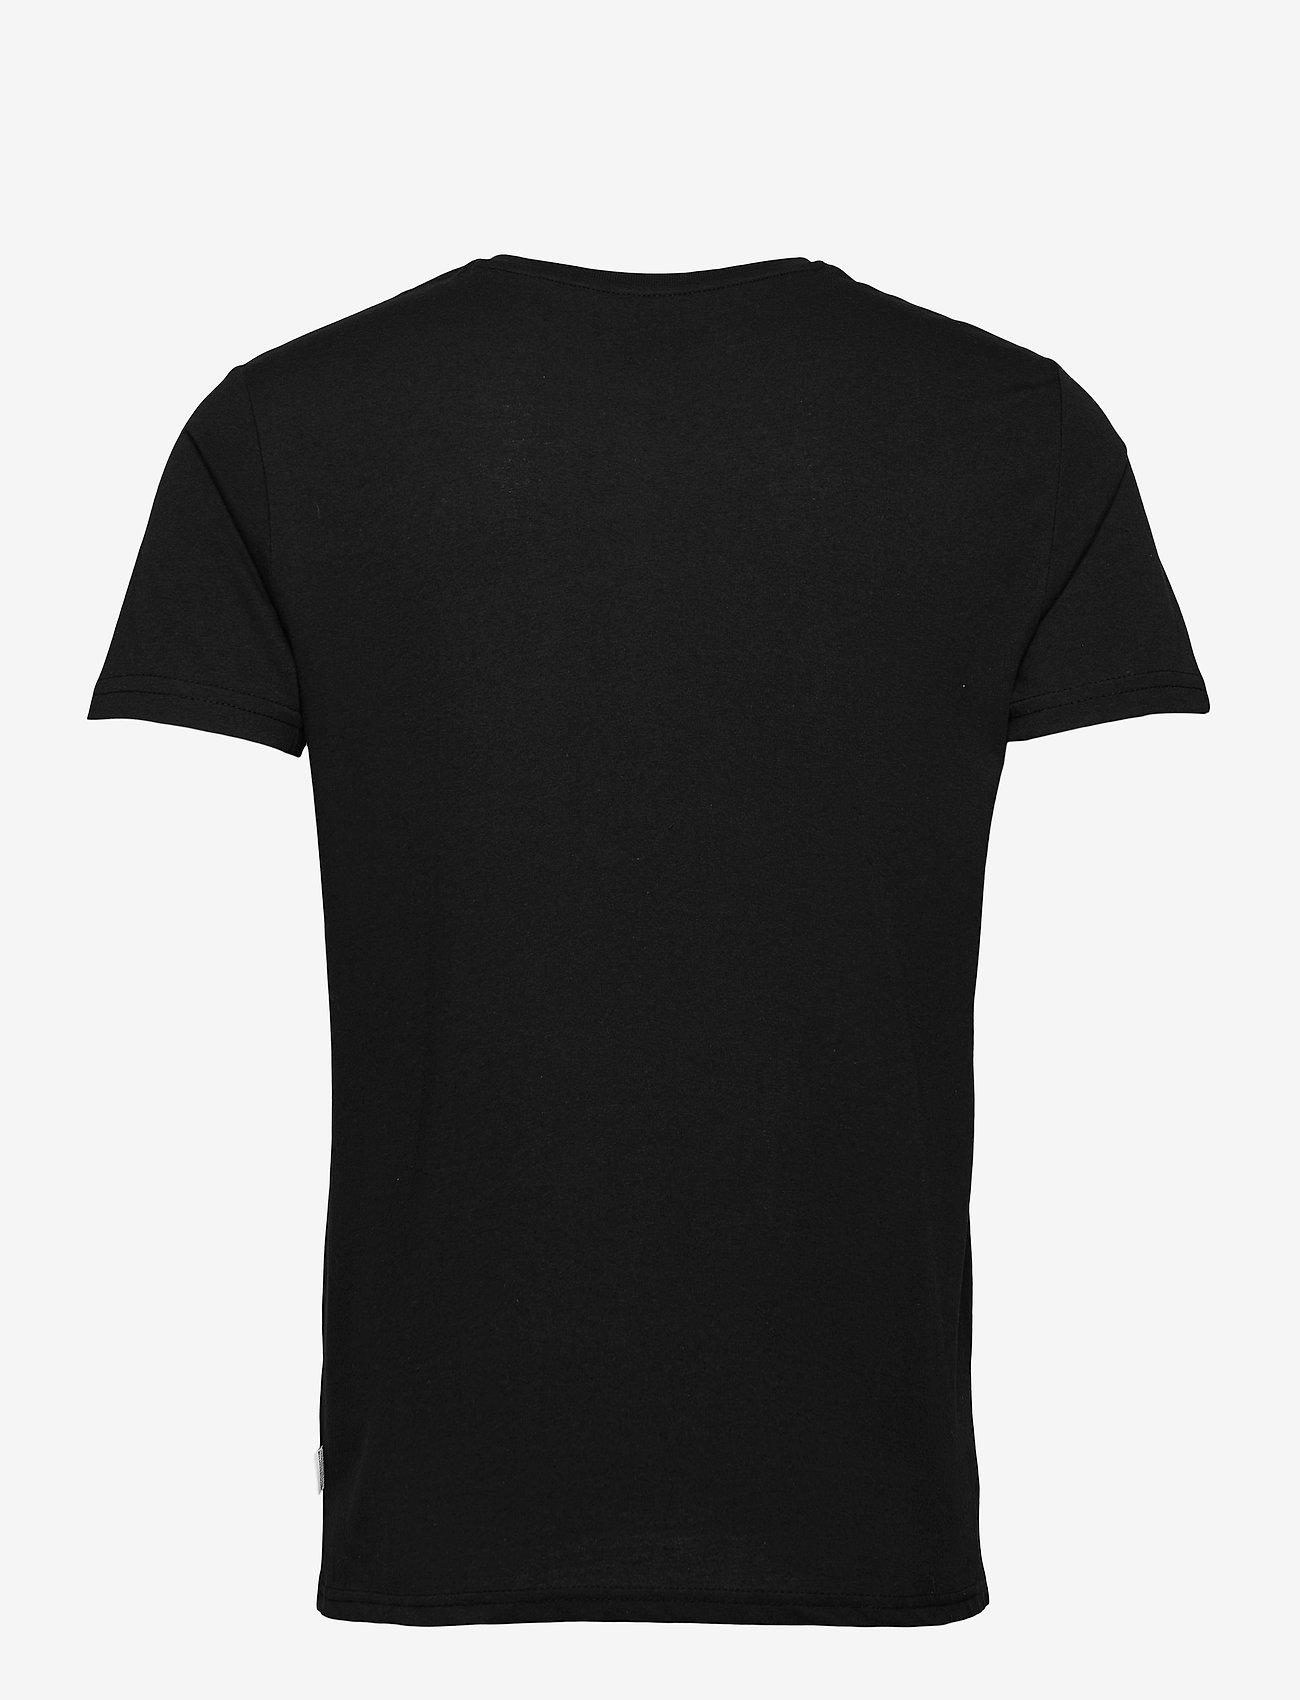 Kronstadt - Timmi Recycled cotton t-shirt - basic t-shirts - black - 1